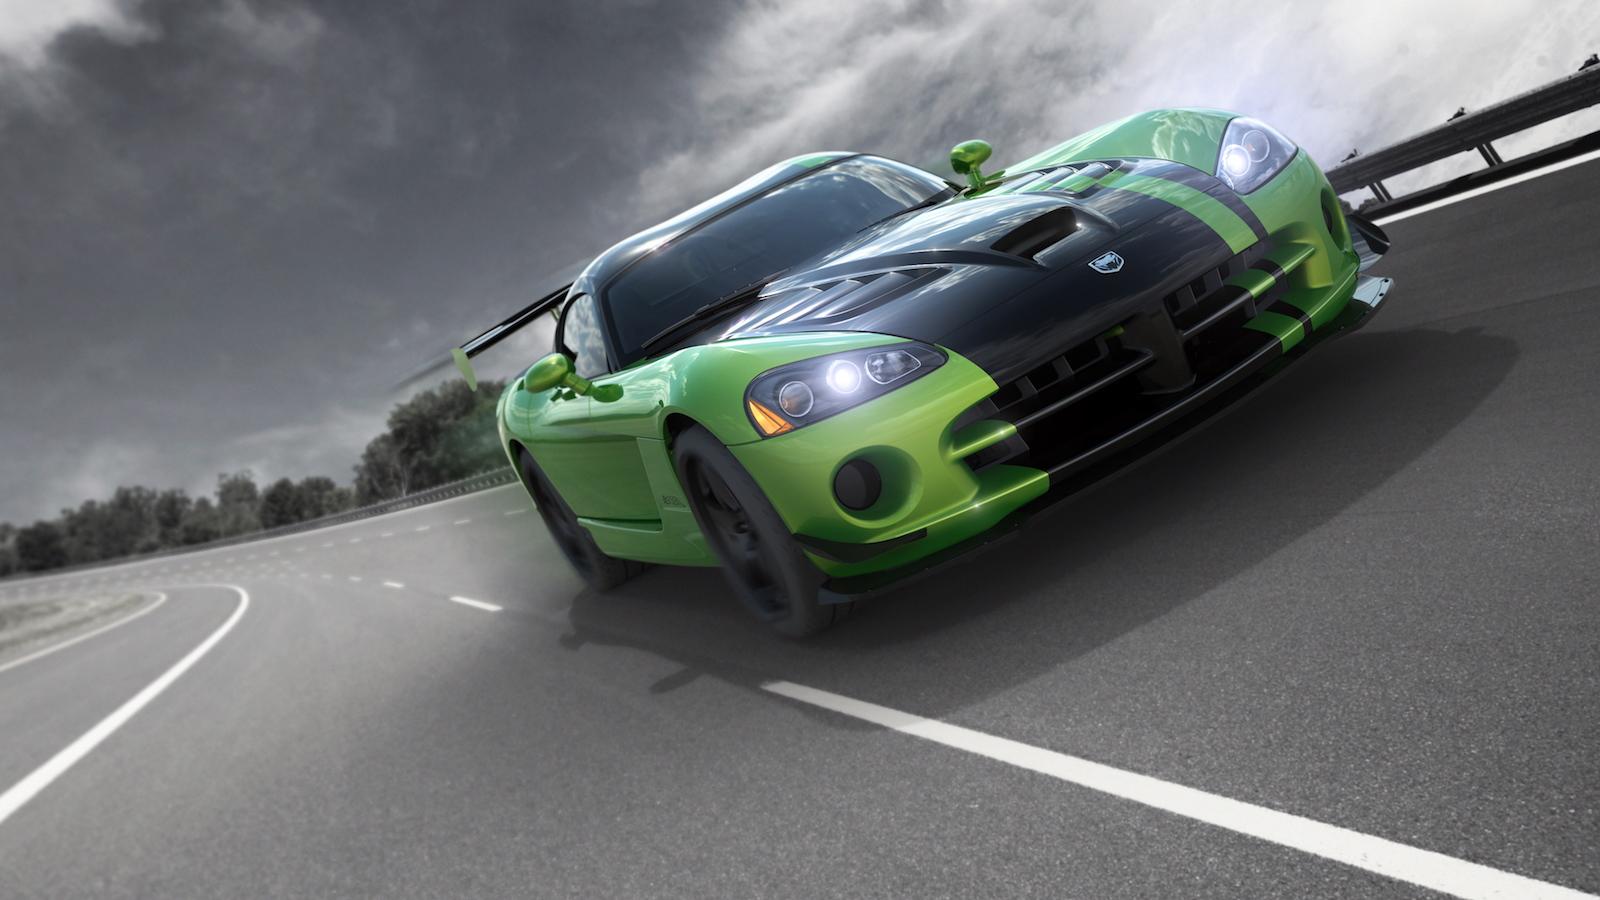 2010 Snakeskin Dodge Viper ACR